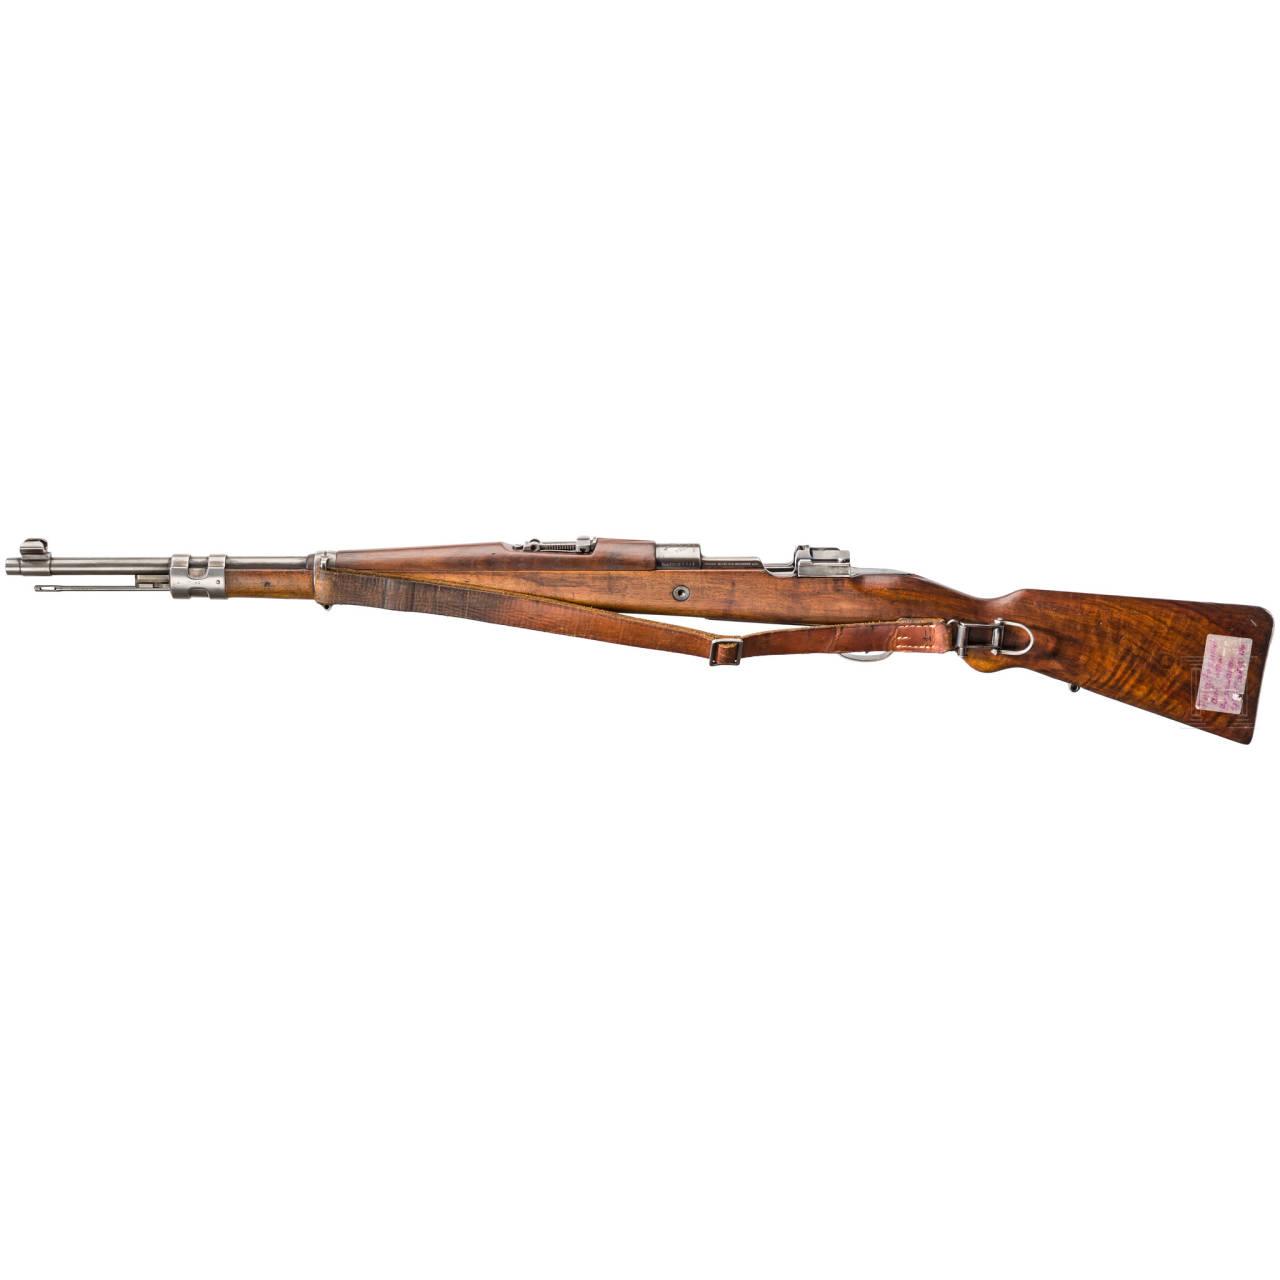 "Karabiner Mod. 1935 (""Carabineros""), Mauser"